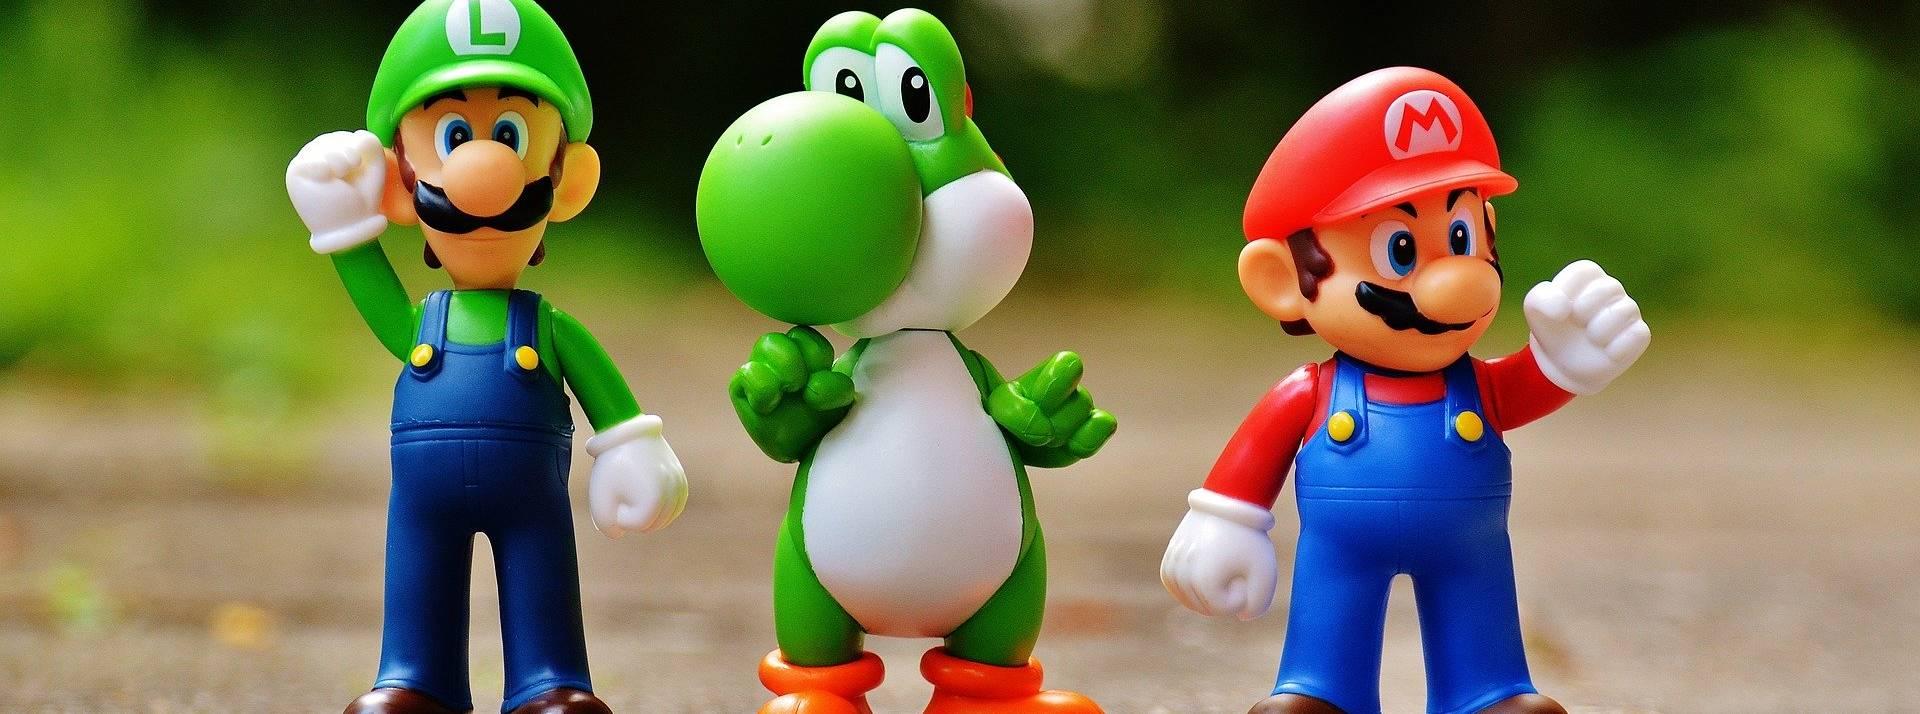 Visue ldu jeu Mario